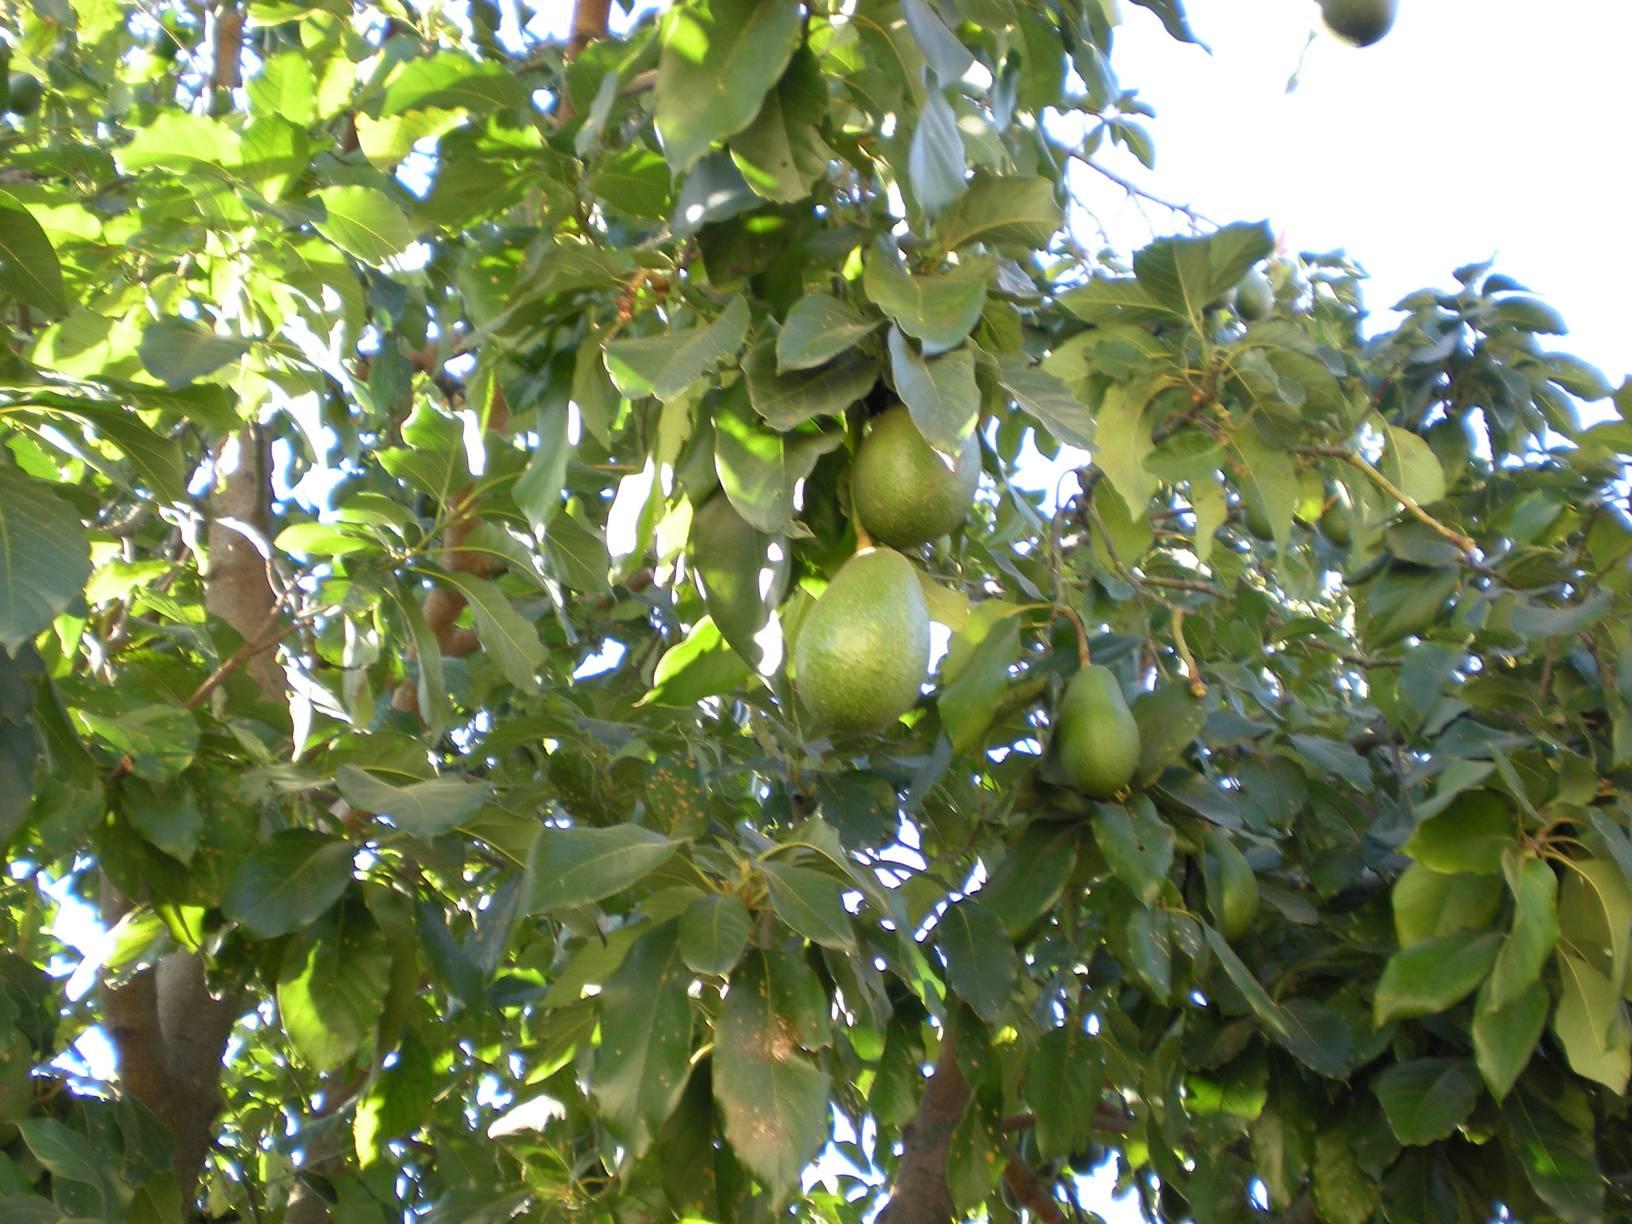 Avocado Oil - Top Organic Skin Care Products Ingredient | Rosemira